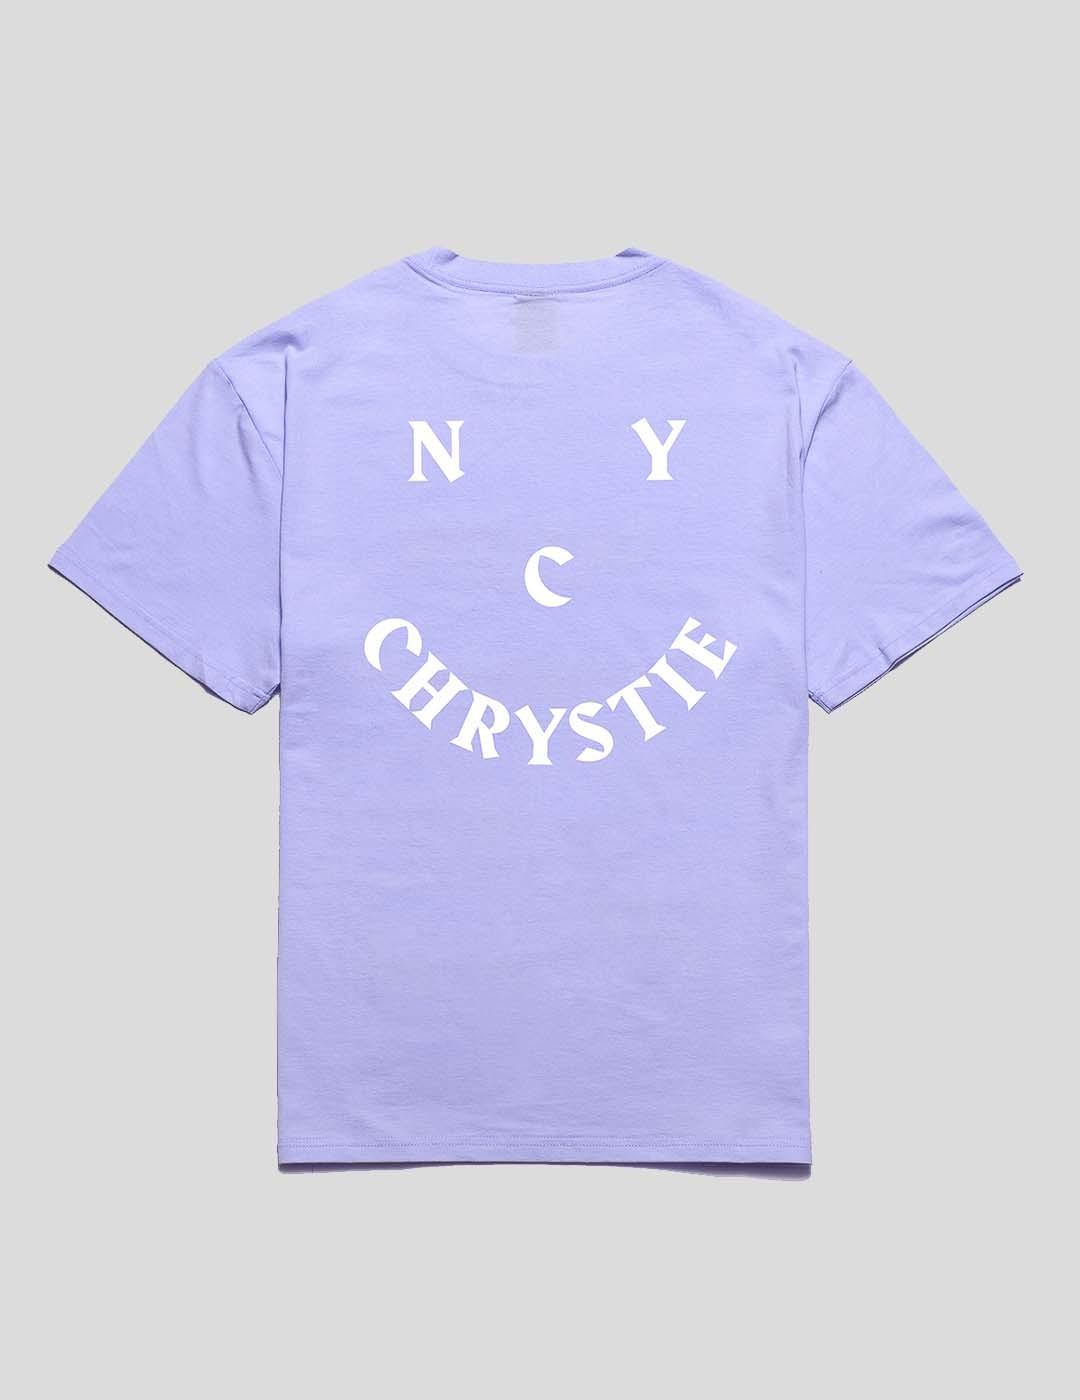 CAMISETA CHRYSTIE NYC SMILE LOGO TEE SWEET LAVENDER